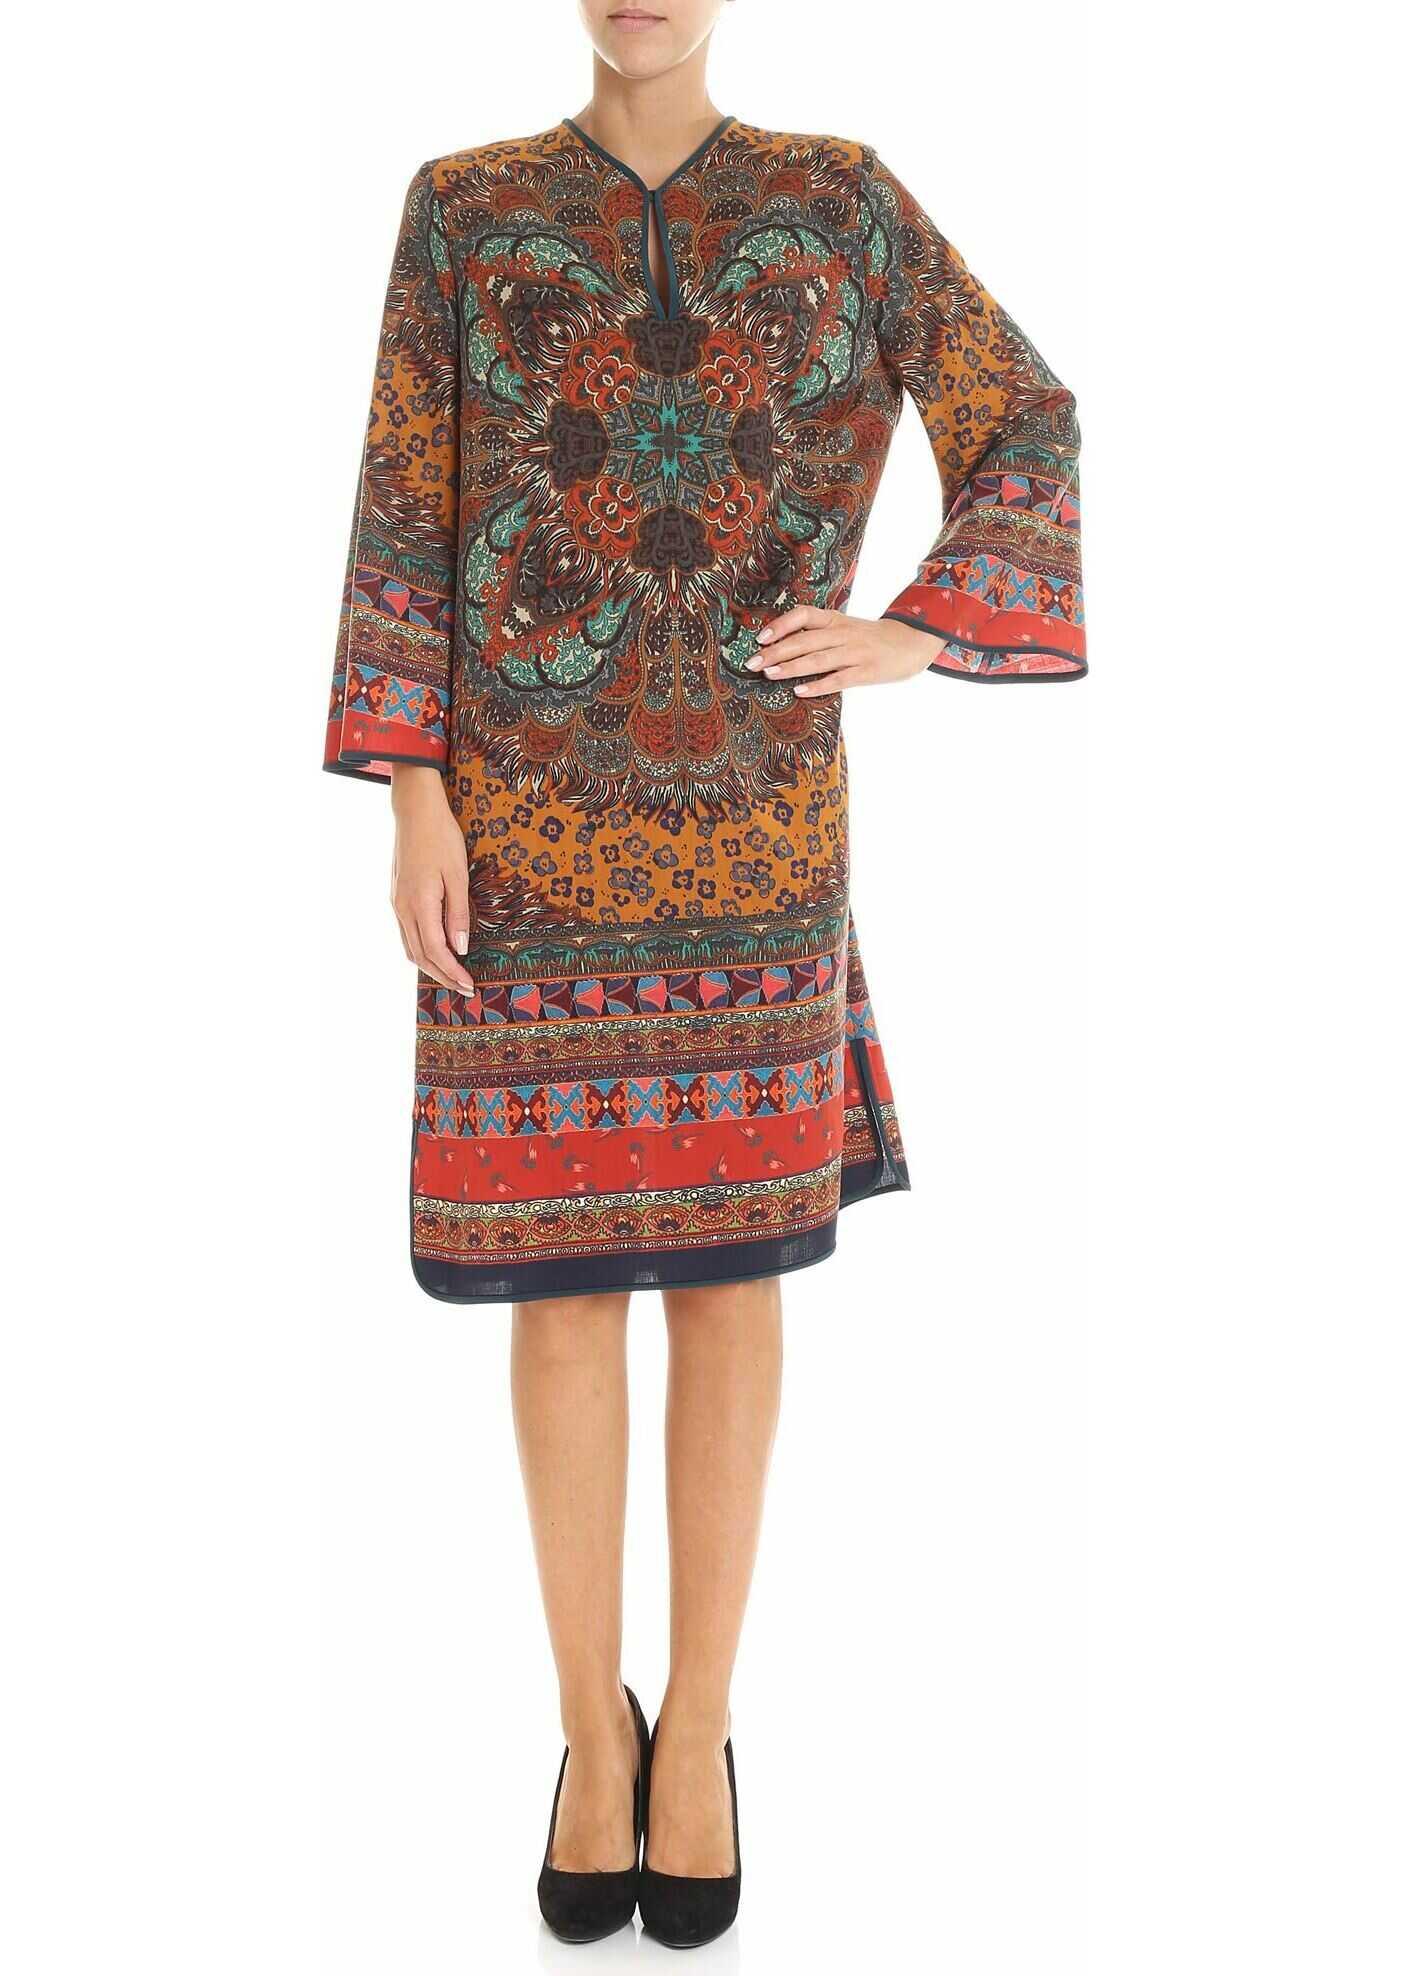 ETRO Multicolour Western Nouveau Printed Dress Multi